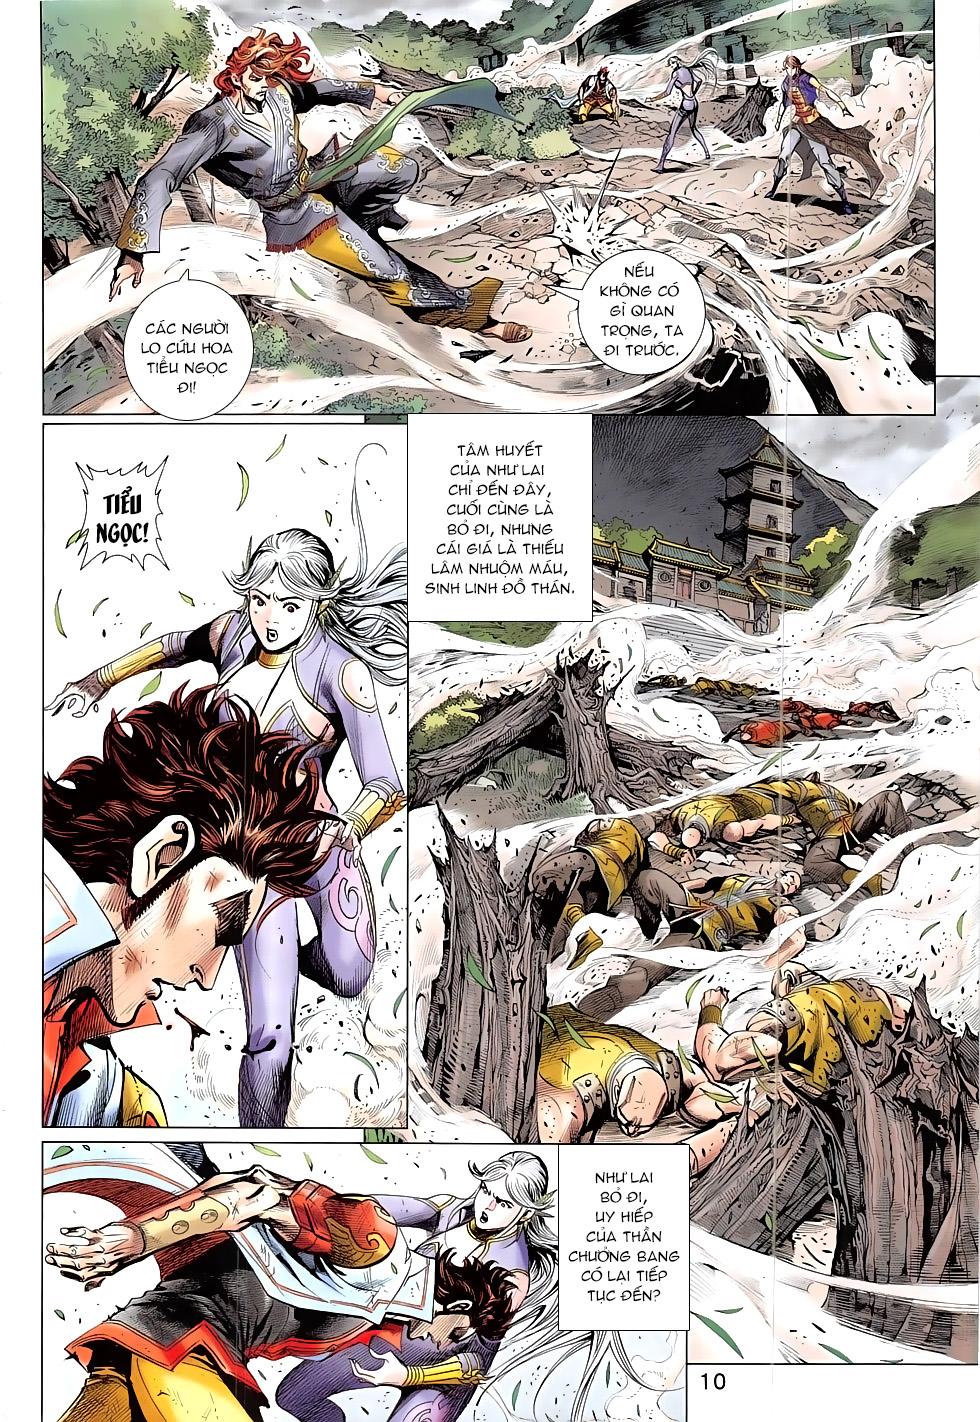 Thần Chưởng chap 24 – End Trang 10 - Mangak.info